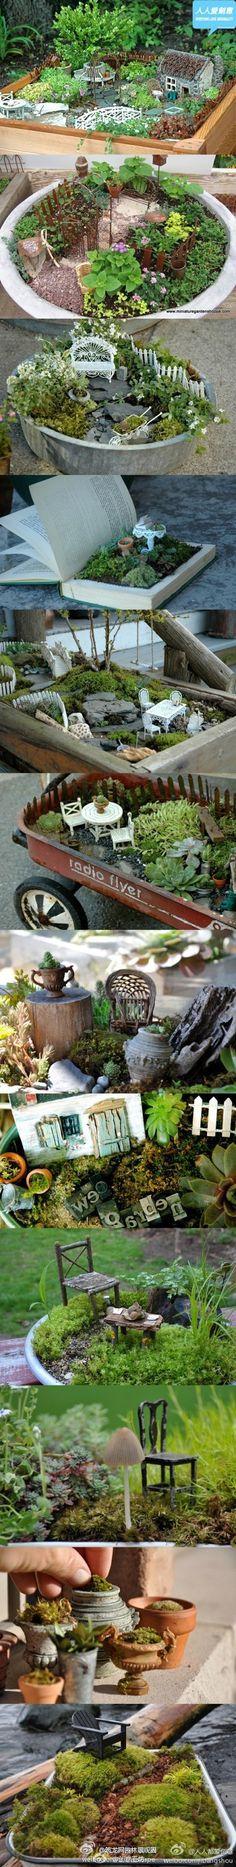 Fairy Garden Ideas  Fairy Garden Hot Tub  #fairy #garden #fairies #garden #kids #children #imagination #creative #magic  #faerie #enchanted #miniature